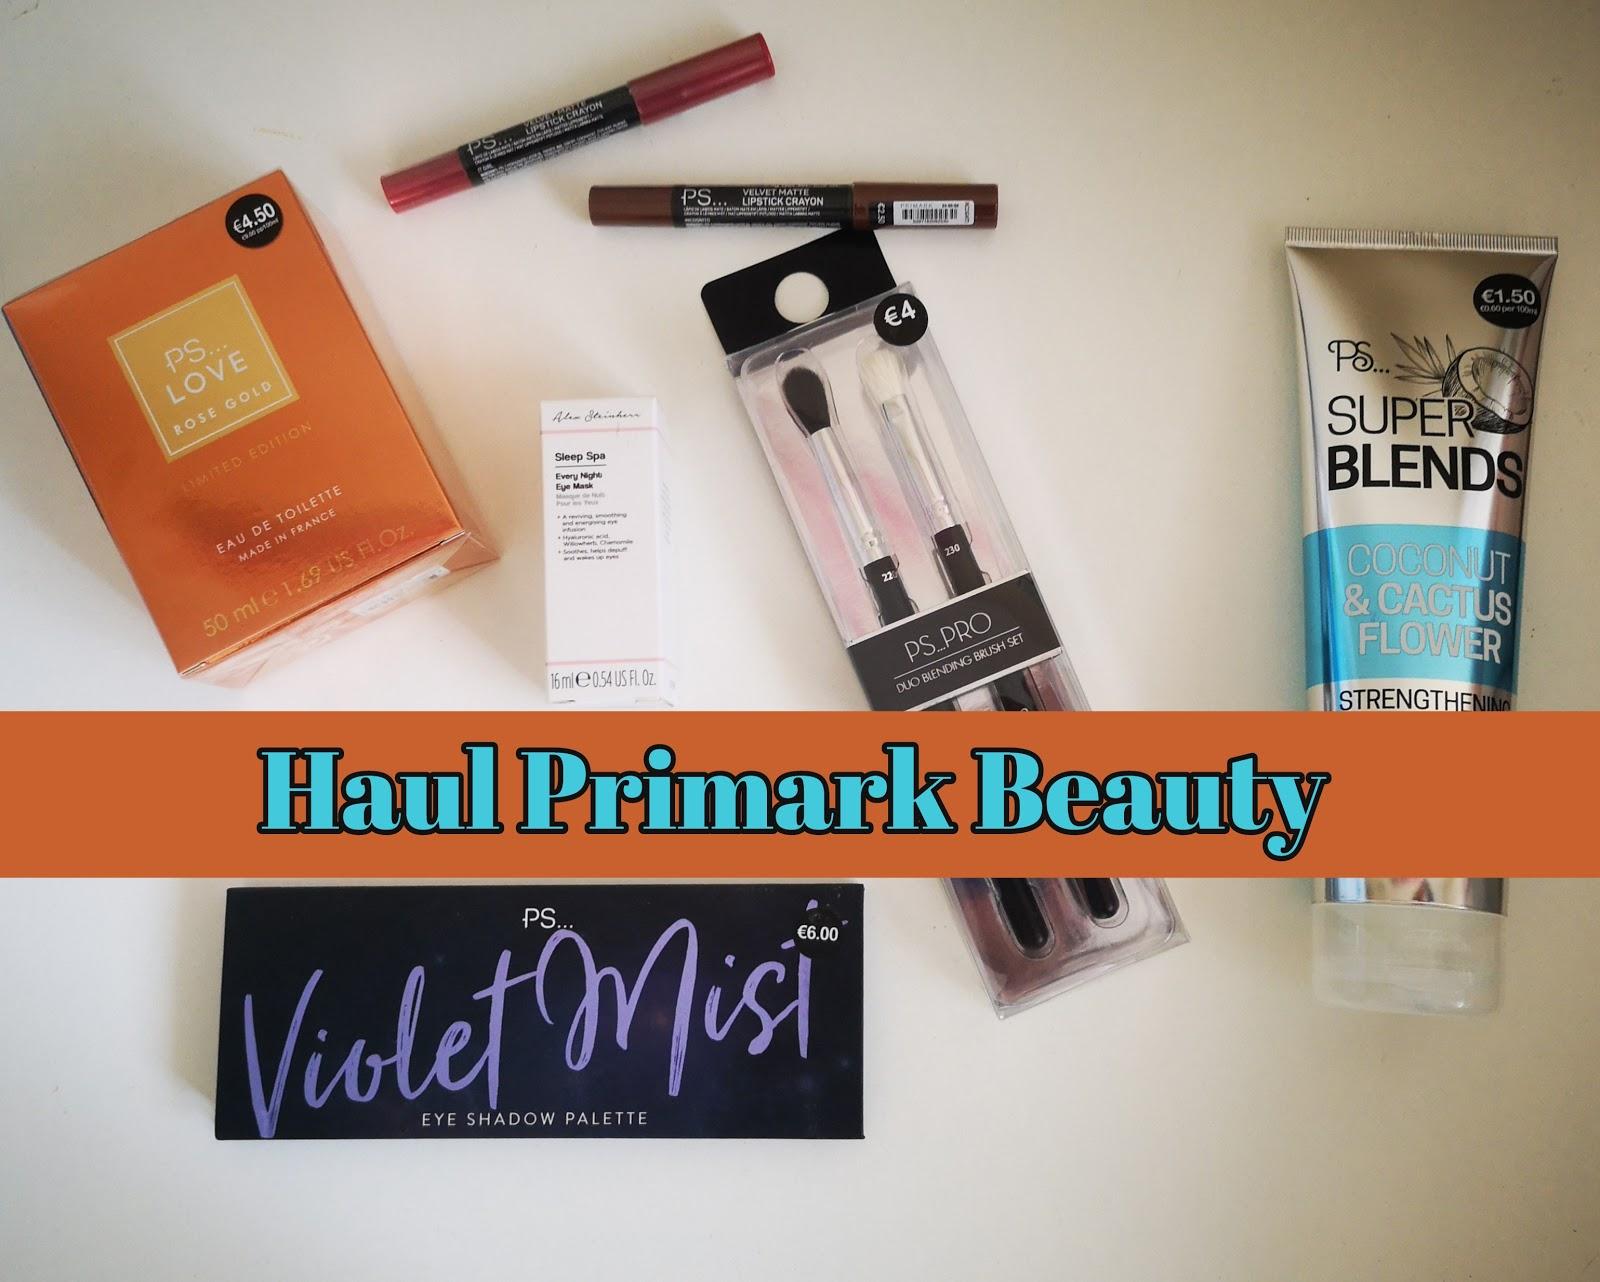 944b55917e Haul Primark Beauty  tratamiento